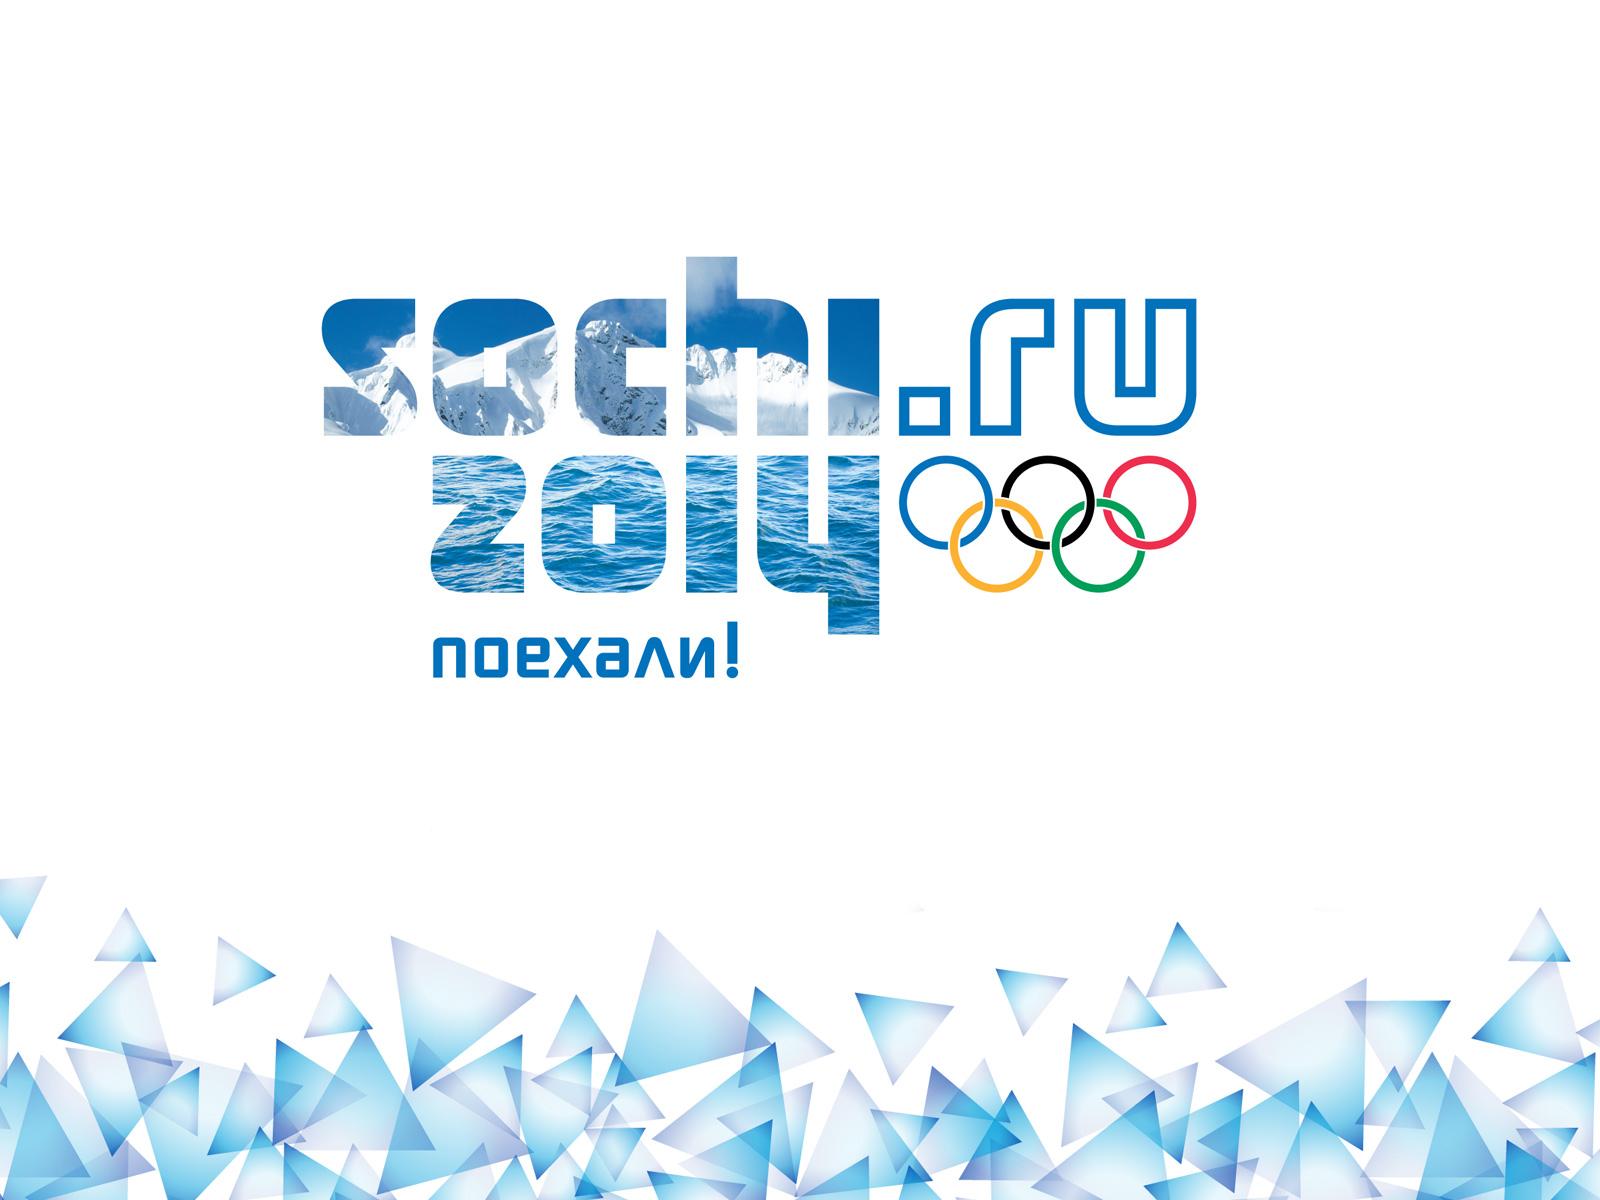 2014-sochi-olympics-poster